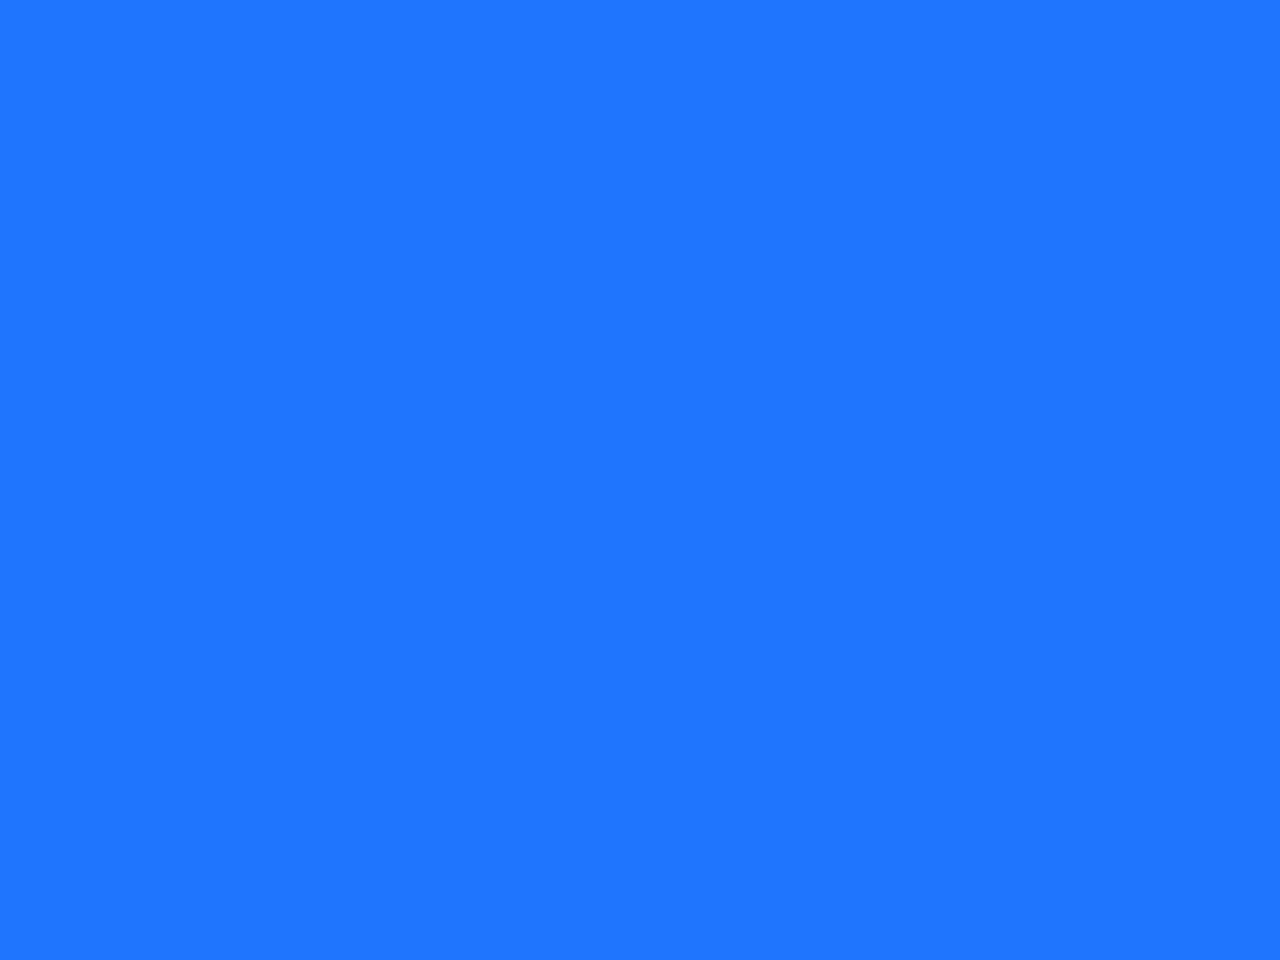 1280x960 Blue Crayola Solid Color Background